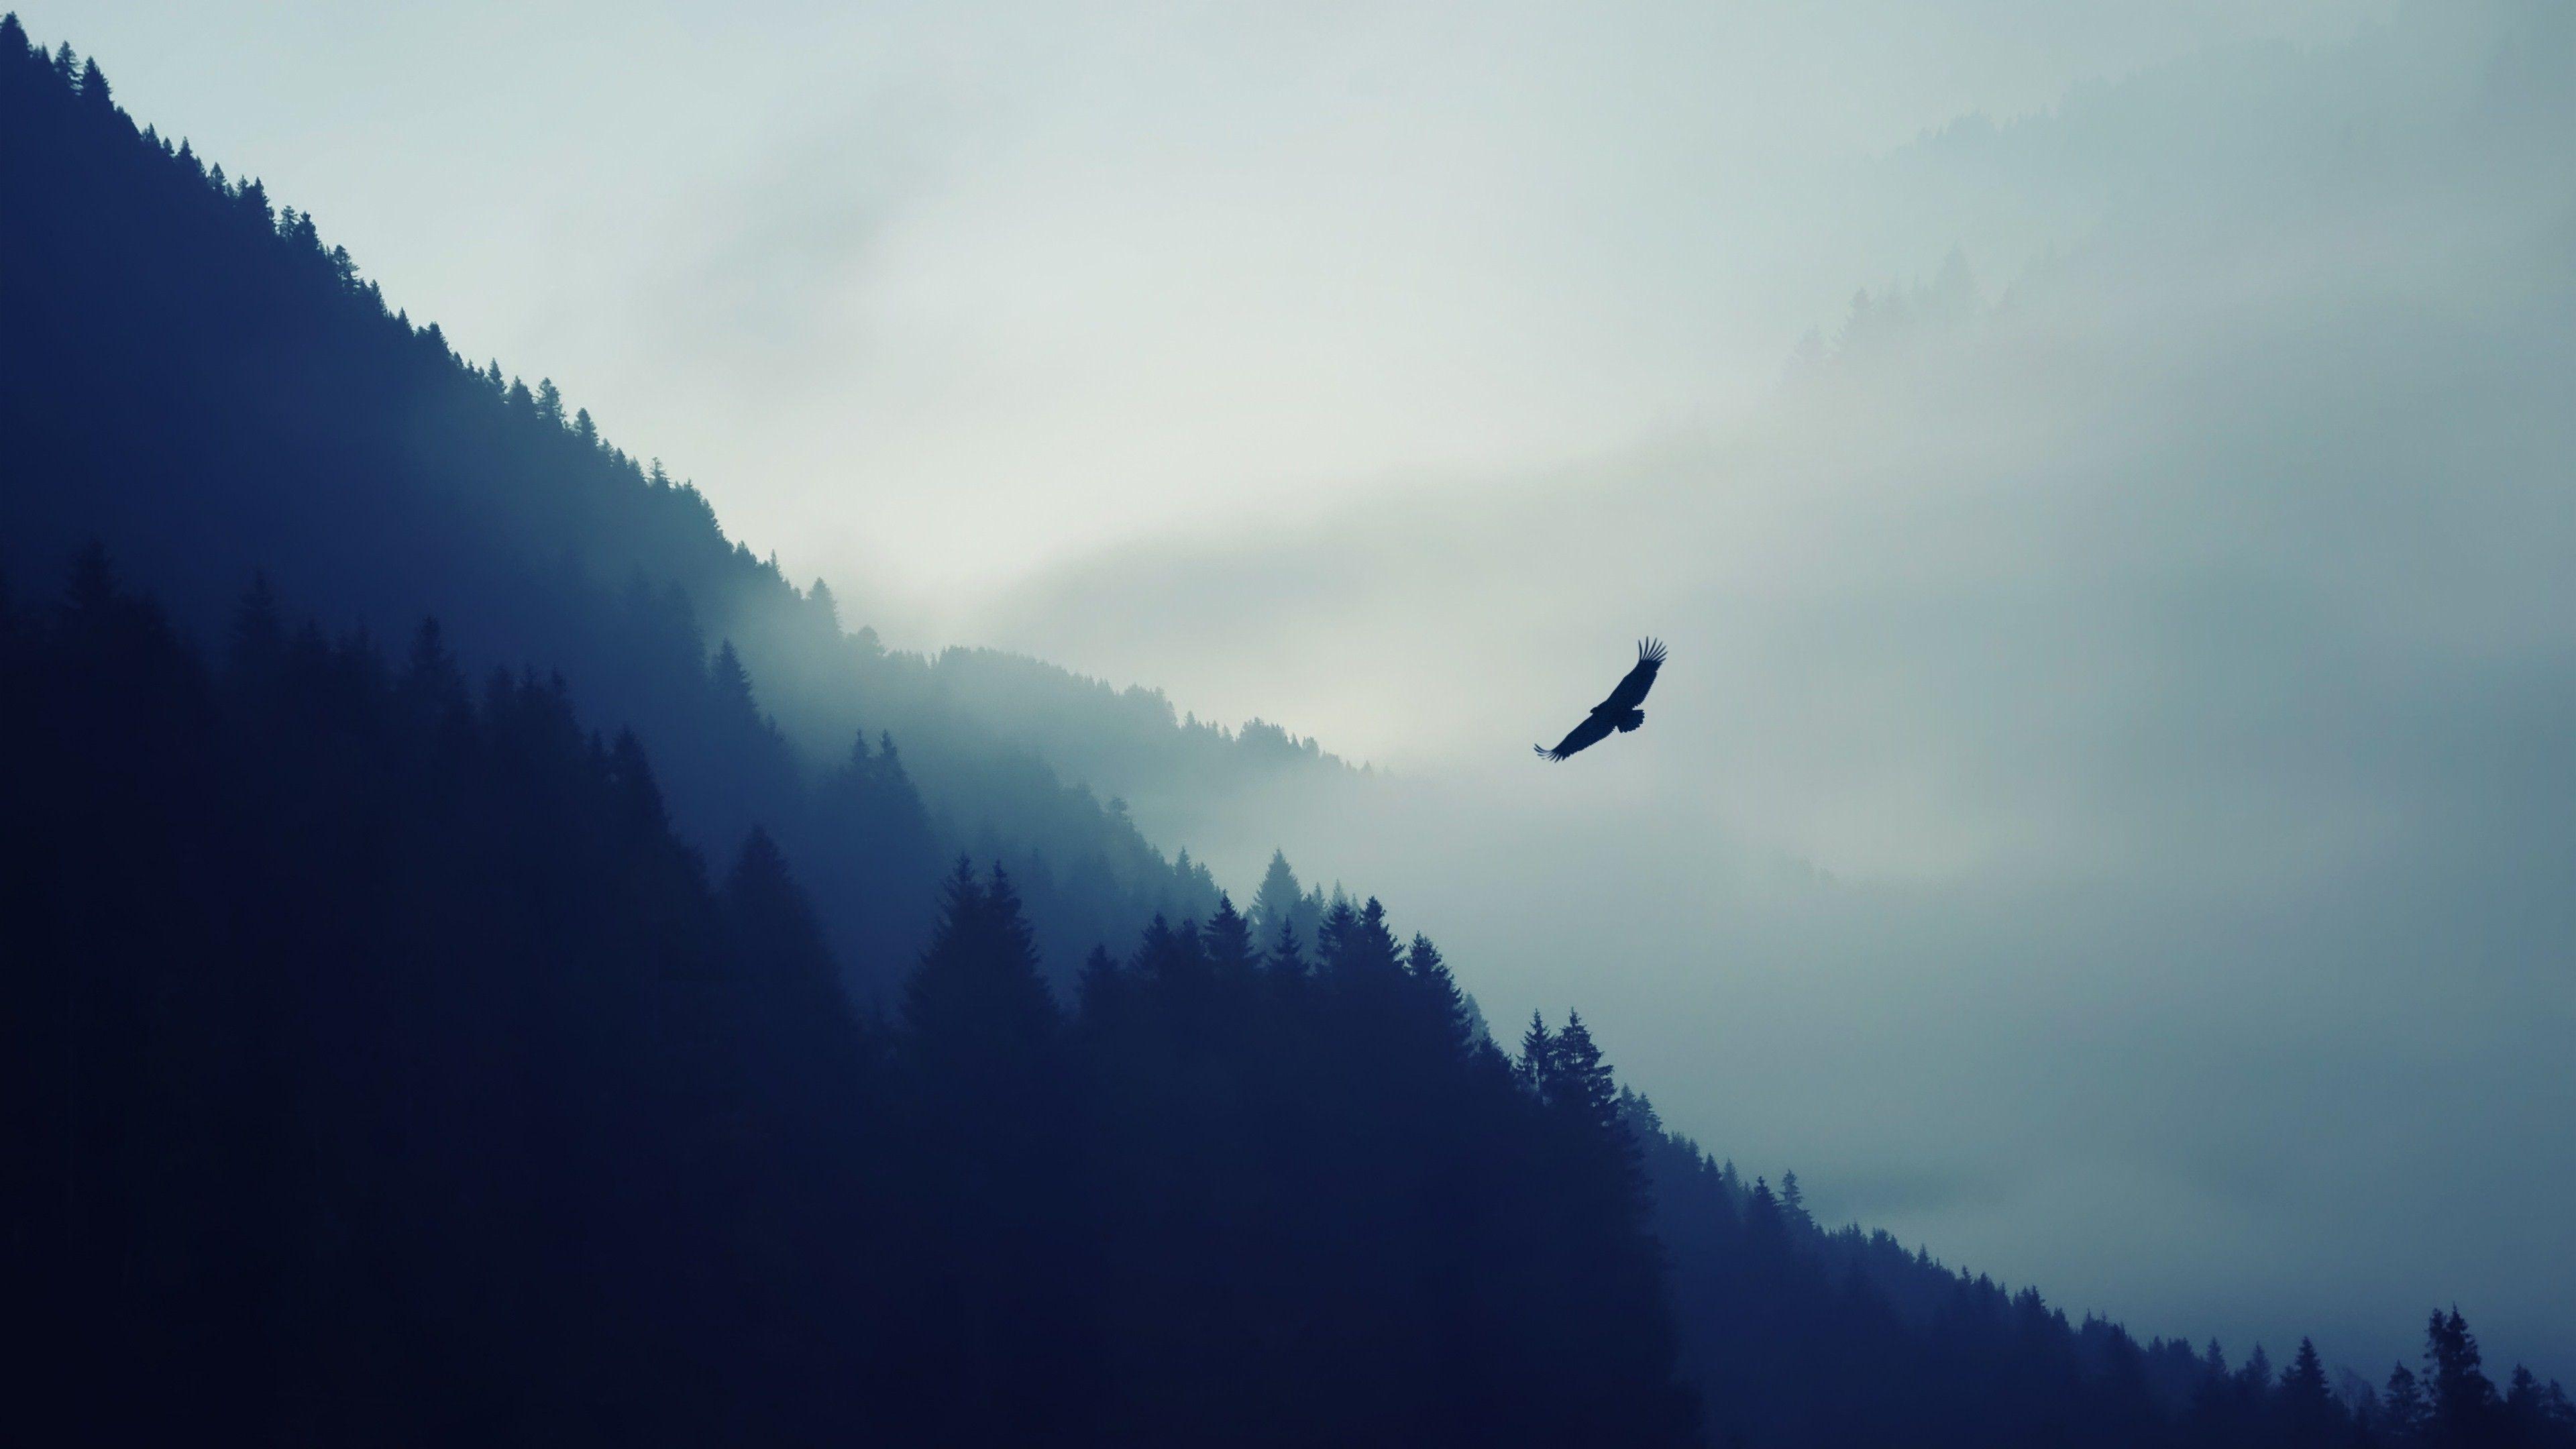 3840x2160 Nature Mountain Eagle Fog Landscape Ultrahd 4k